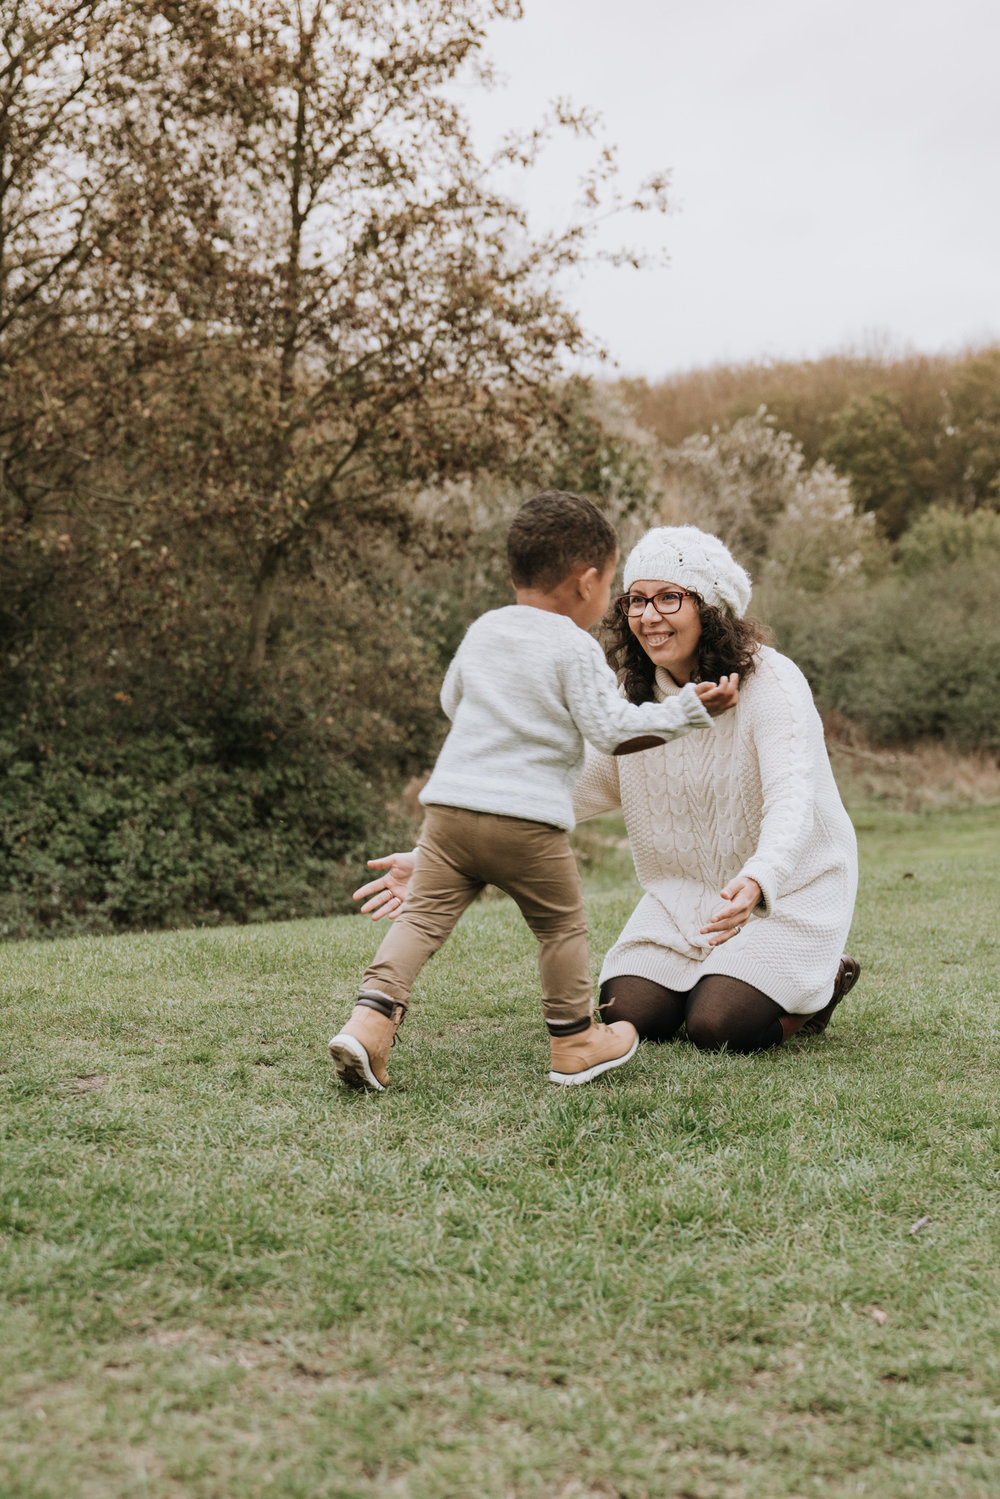 Grace-Elizabeth-Woodland-Family-Photography-Lifestyle-Essex-Norfolk-Suffolk-20.jpg